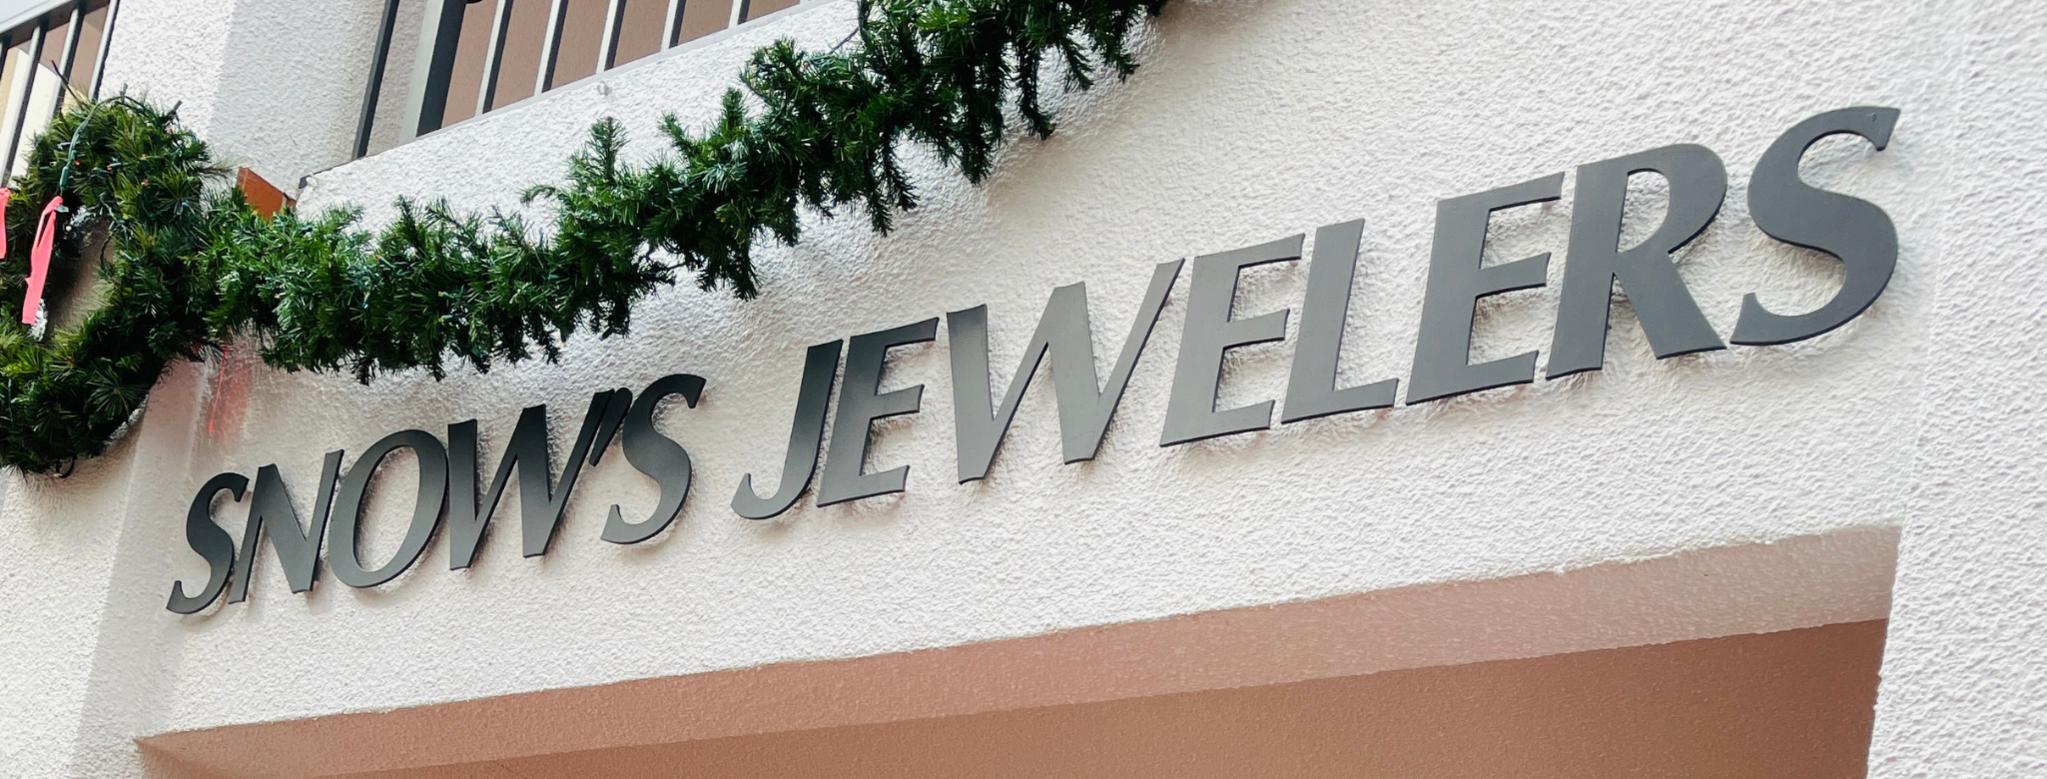 Snow's Jewelers Miami Lakes Florida Top Jewelry Store Miami  Lakes